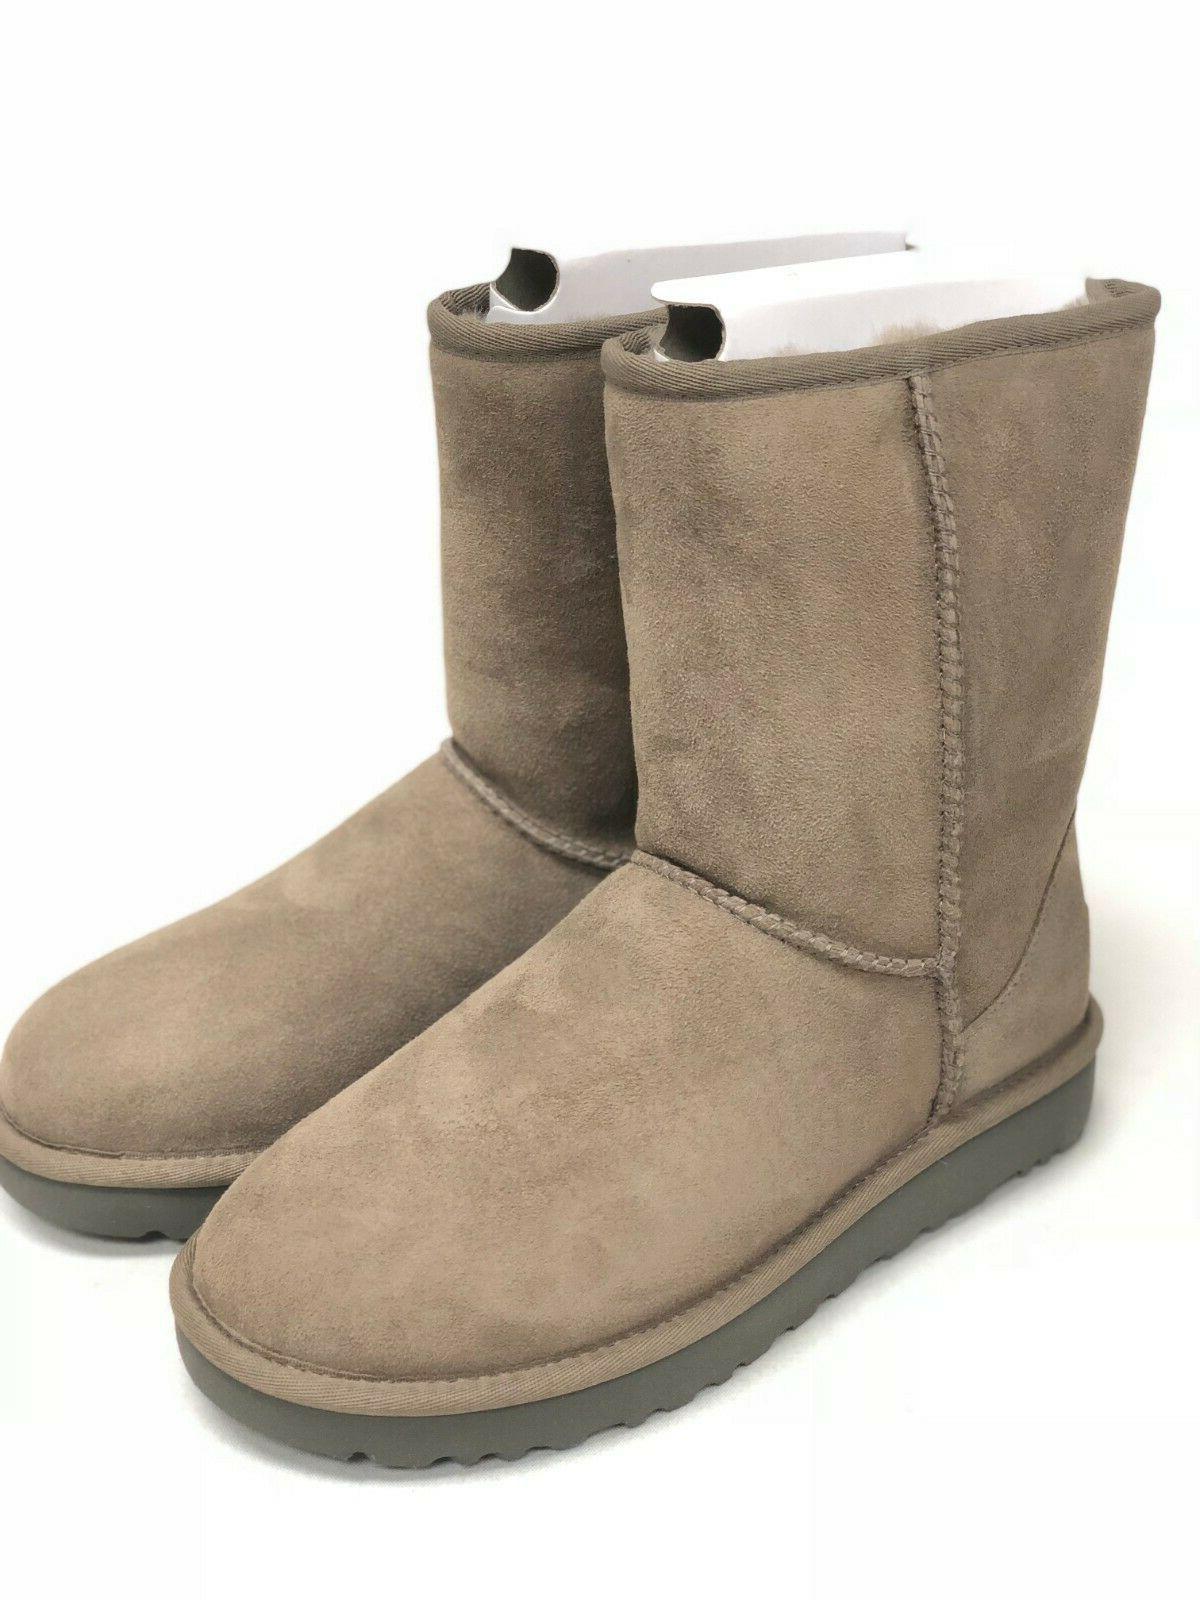 UGG Short II Brindle 1016223 Sheepskin Suede